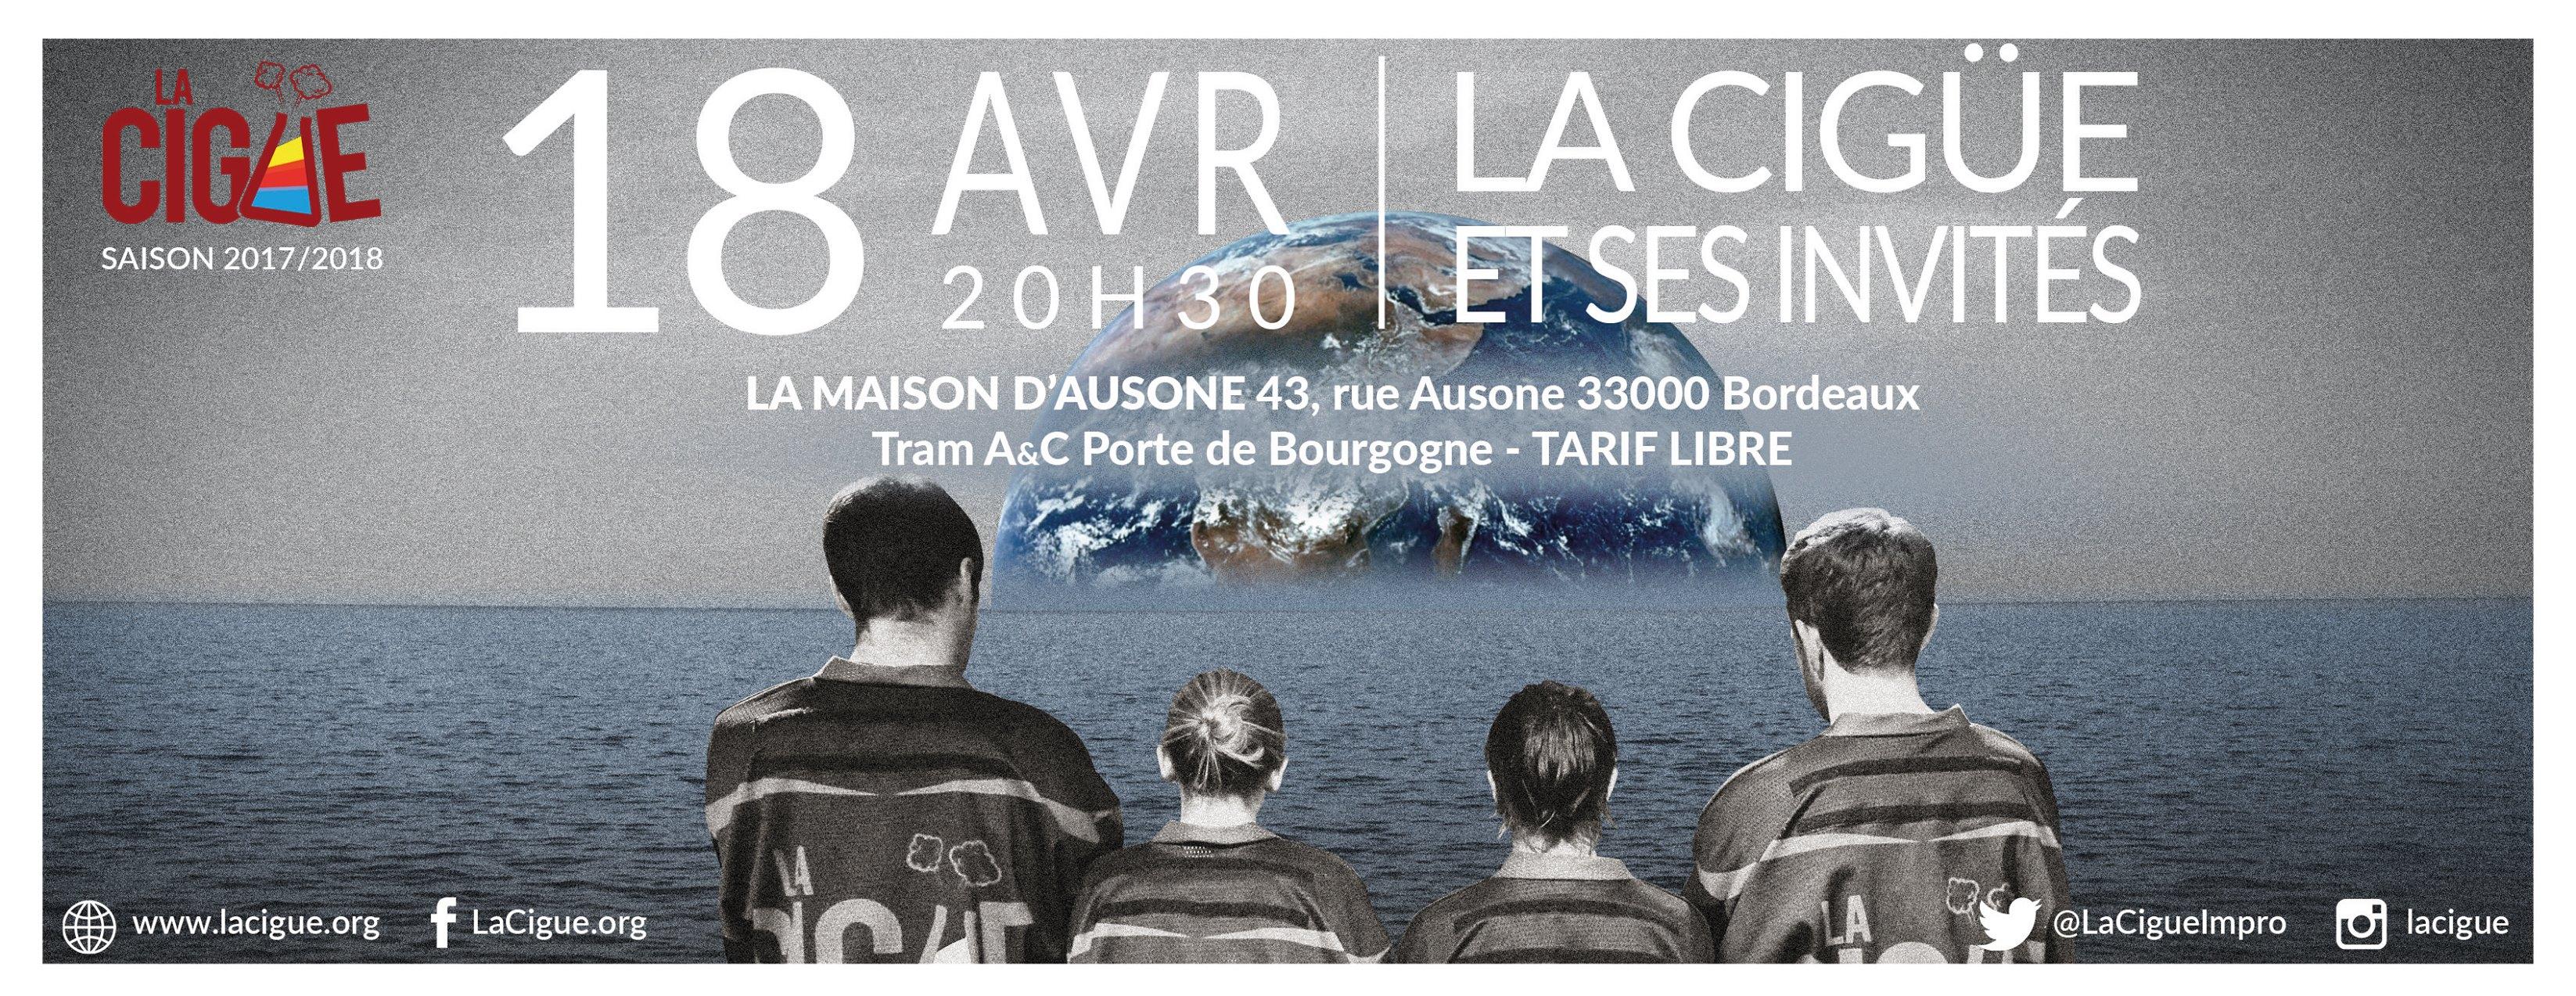 Avec invités # 8 – 4, 3, 2,1 avec La Licoeur